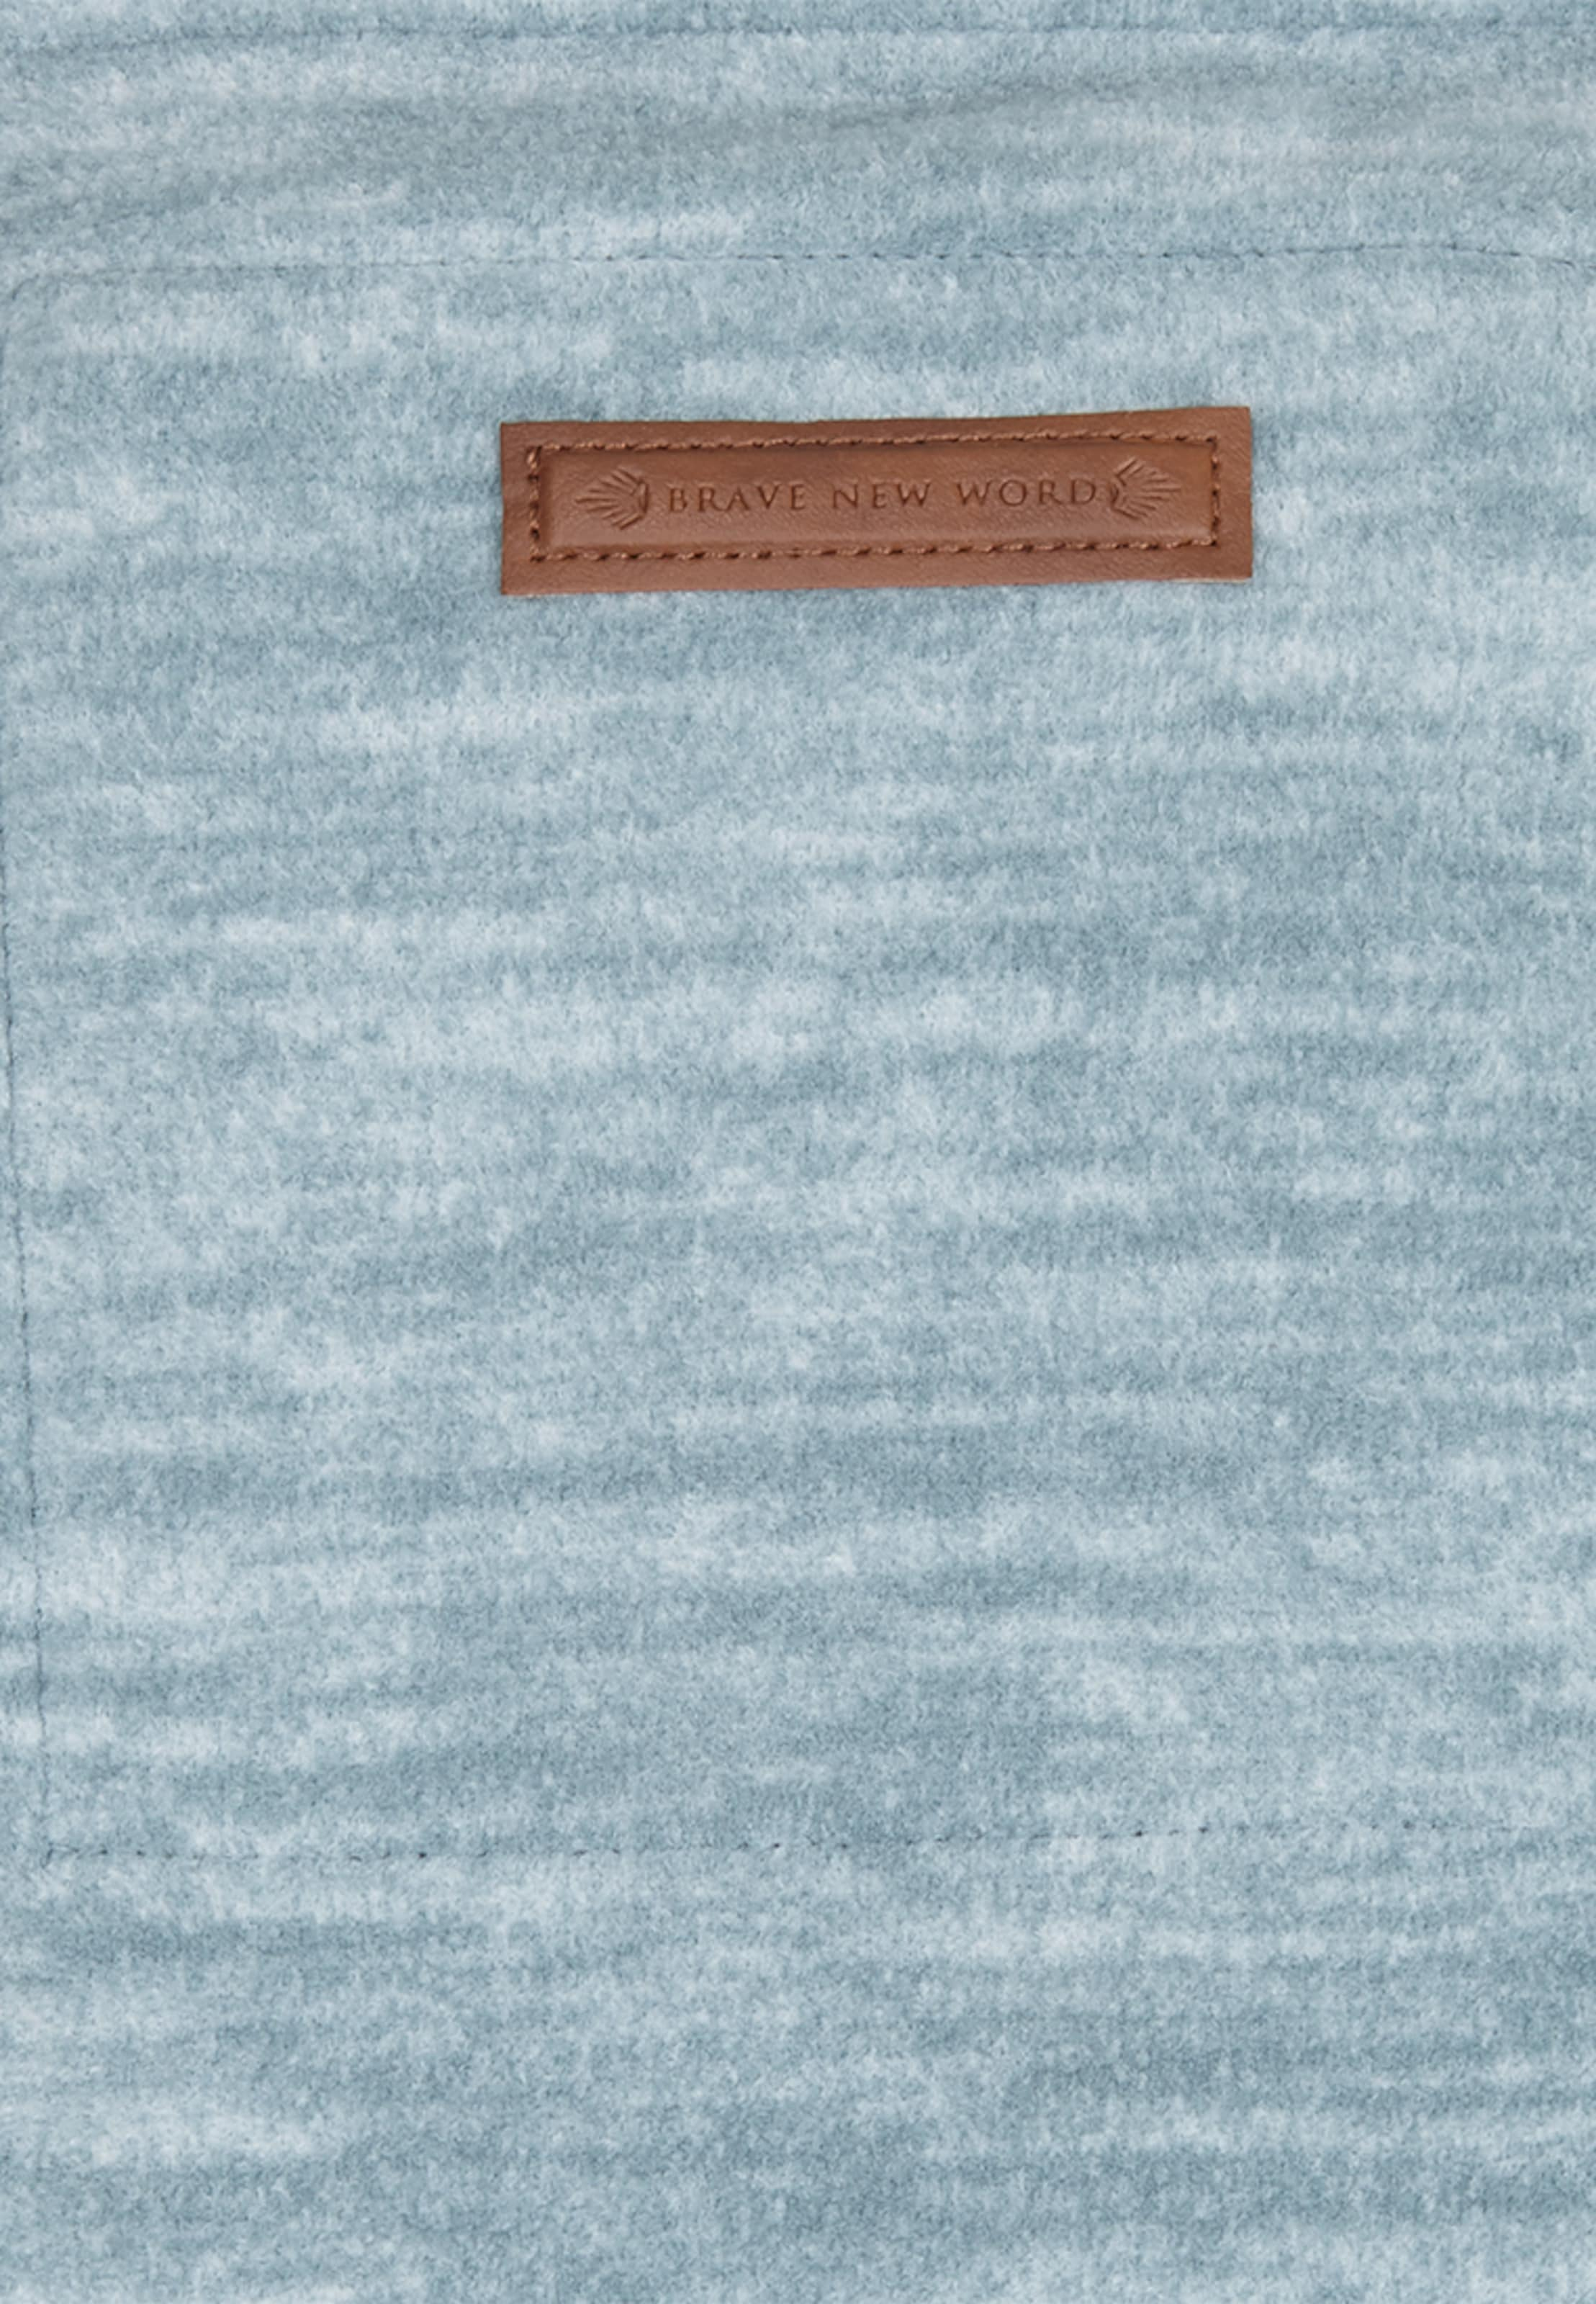 Billig Verkauf Visum Zahlung naketano Male Zipped Jacket 'Schnitzelpopizel III' Spielraum Online Amazon Rabatt Browse t3dwaAp